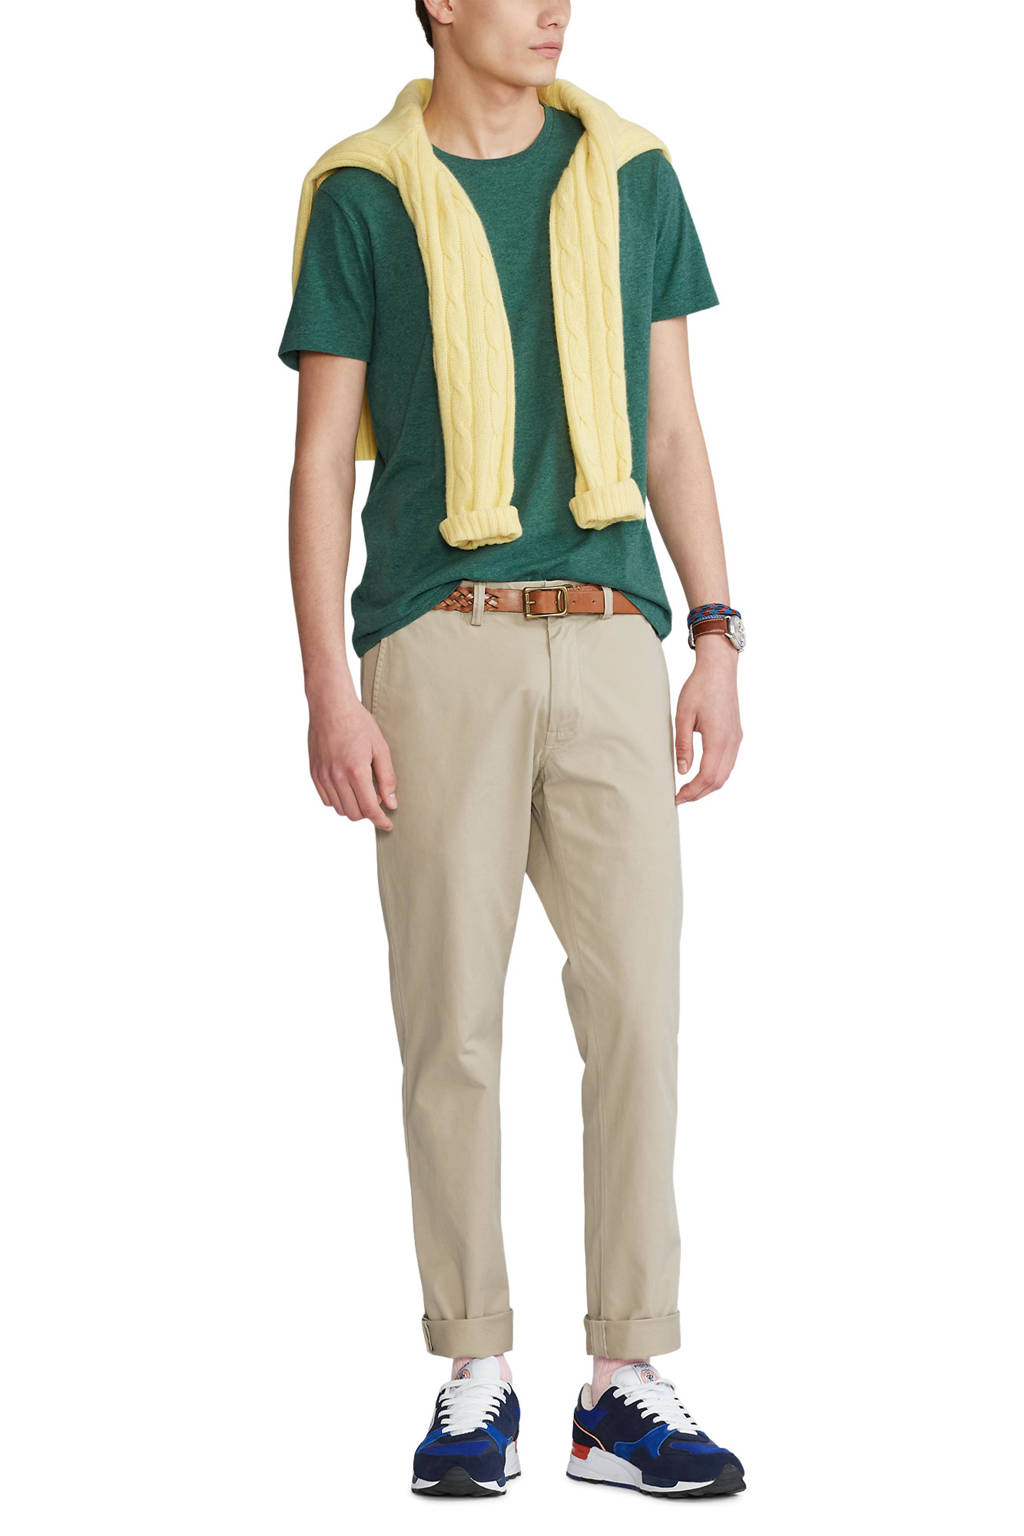 POLO Ralph Lauren T-shirt verano green, Verano Green